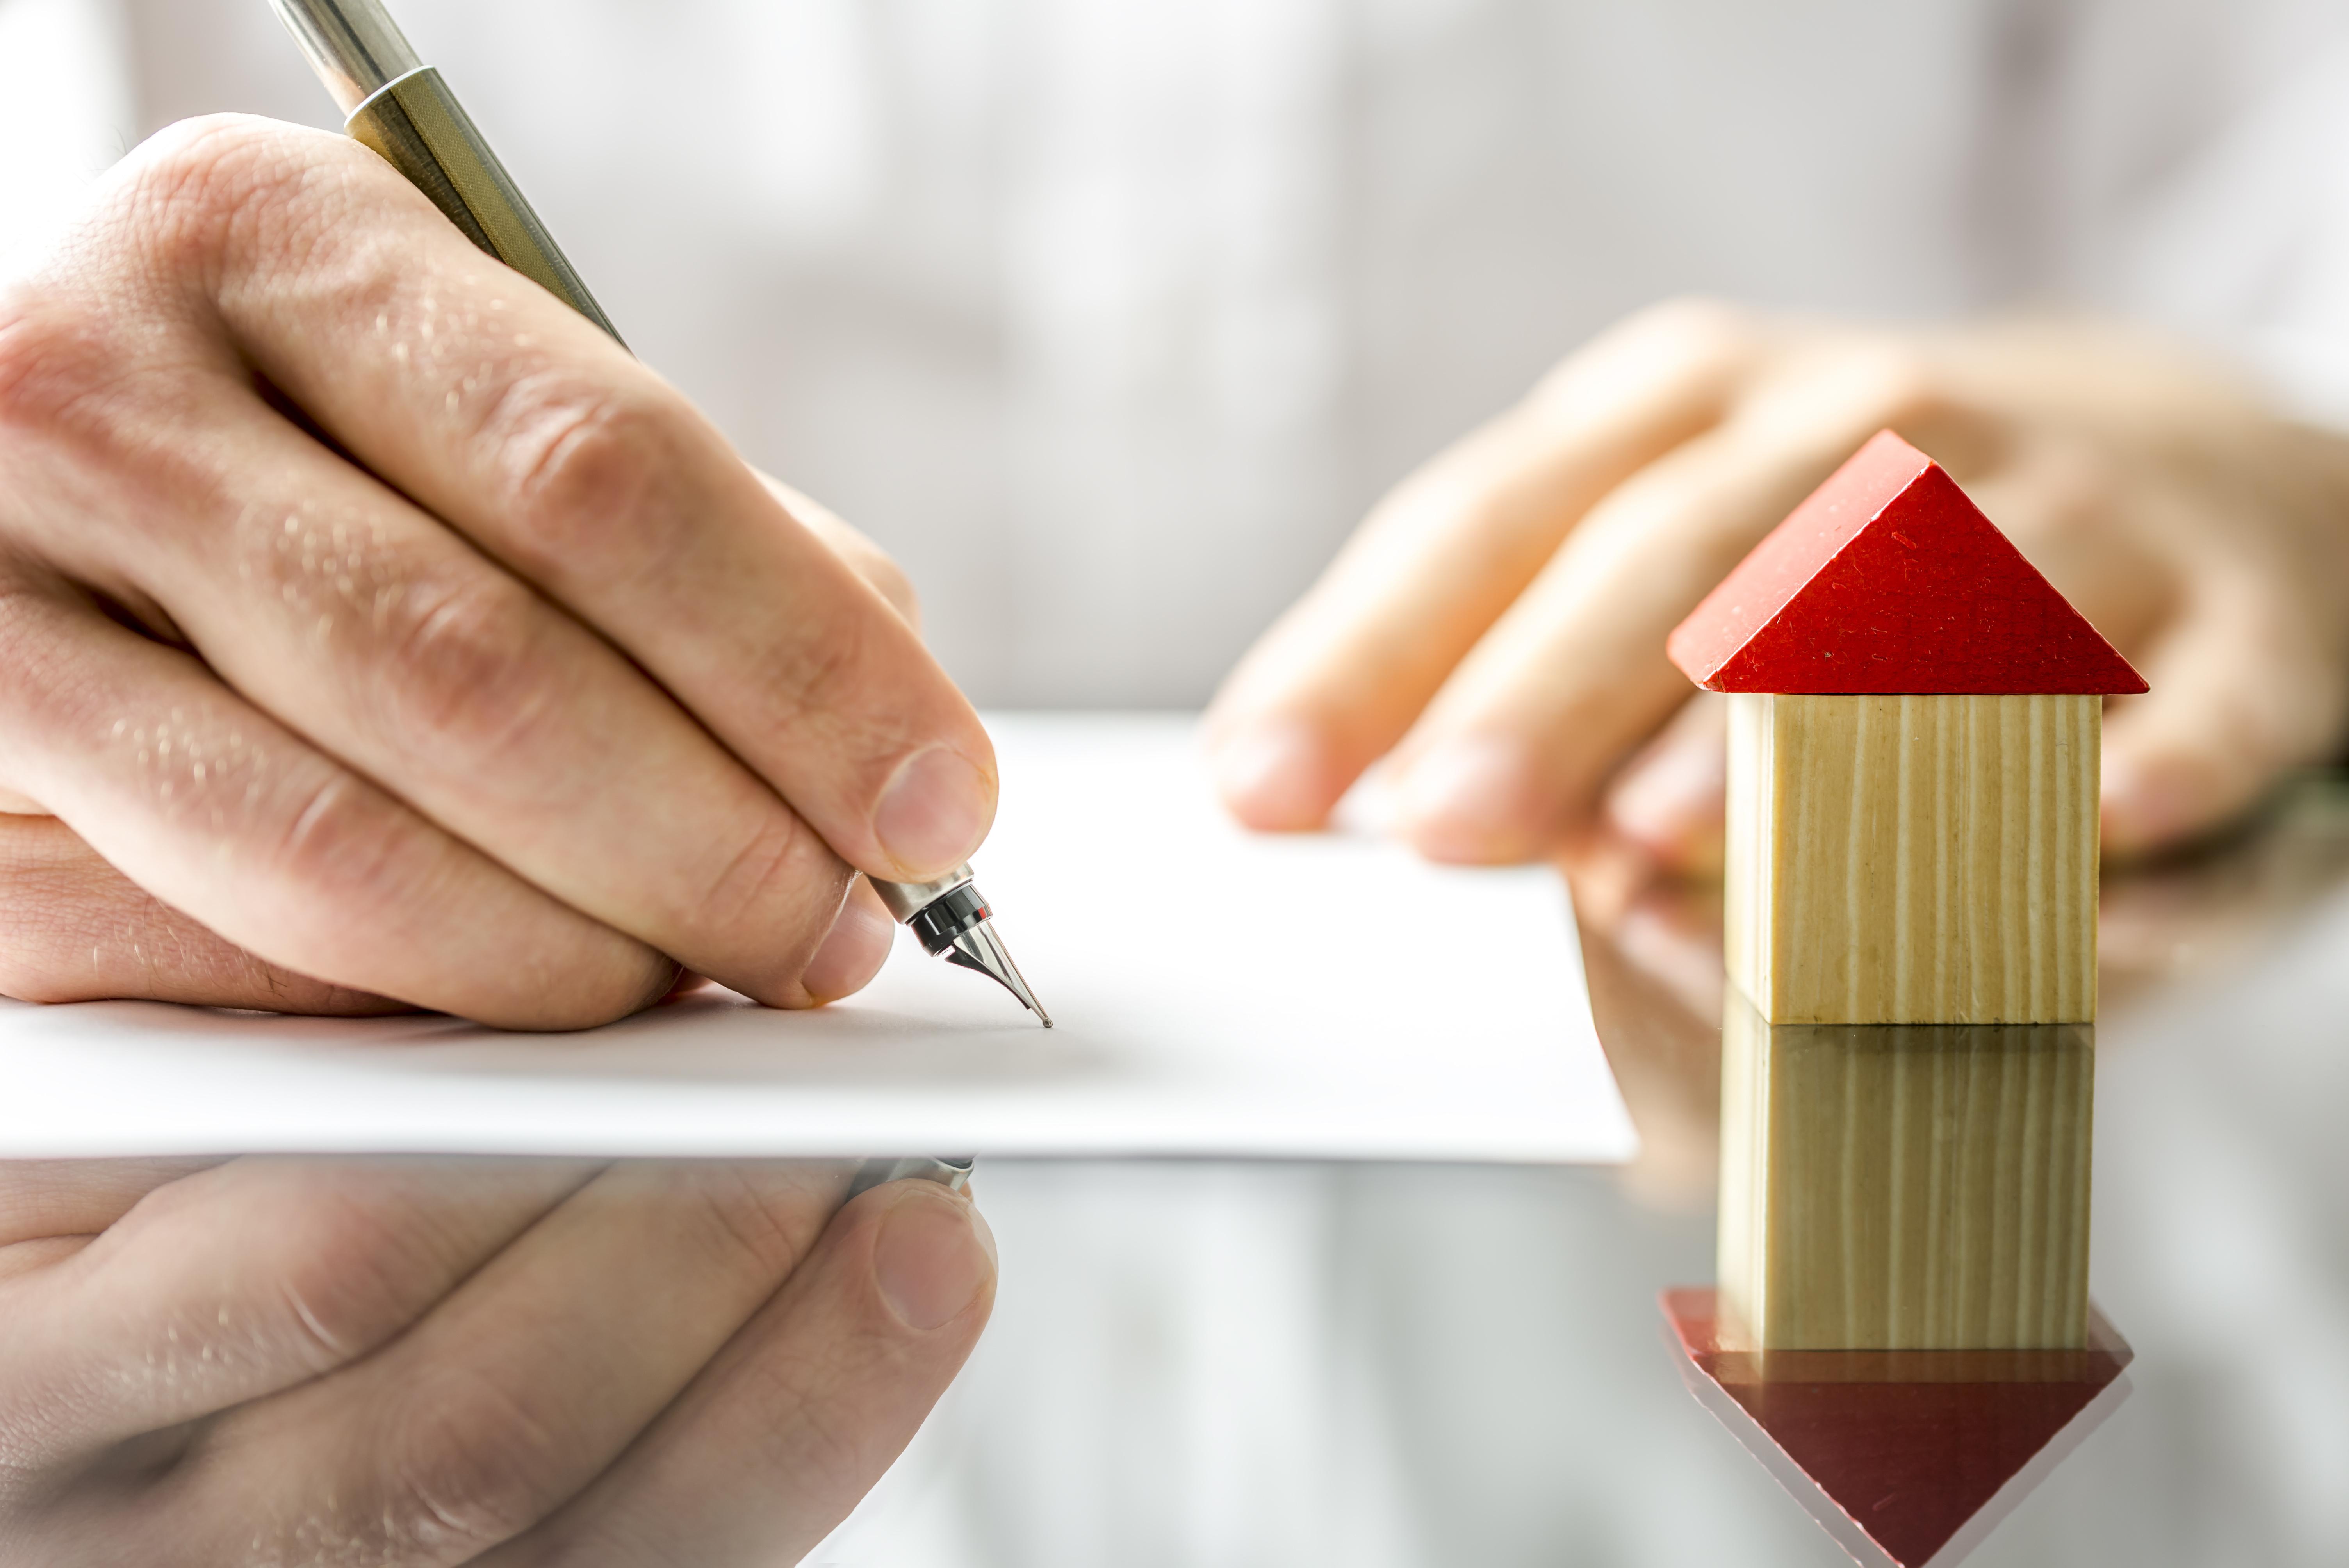 mortgage application covid-19 coronavirus